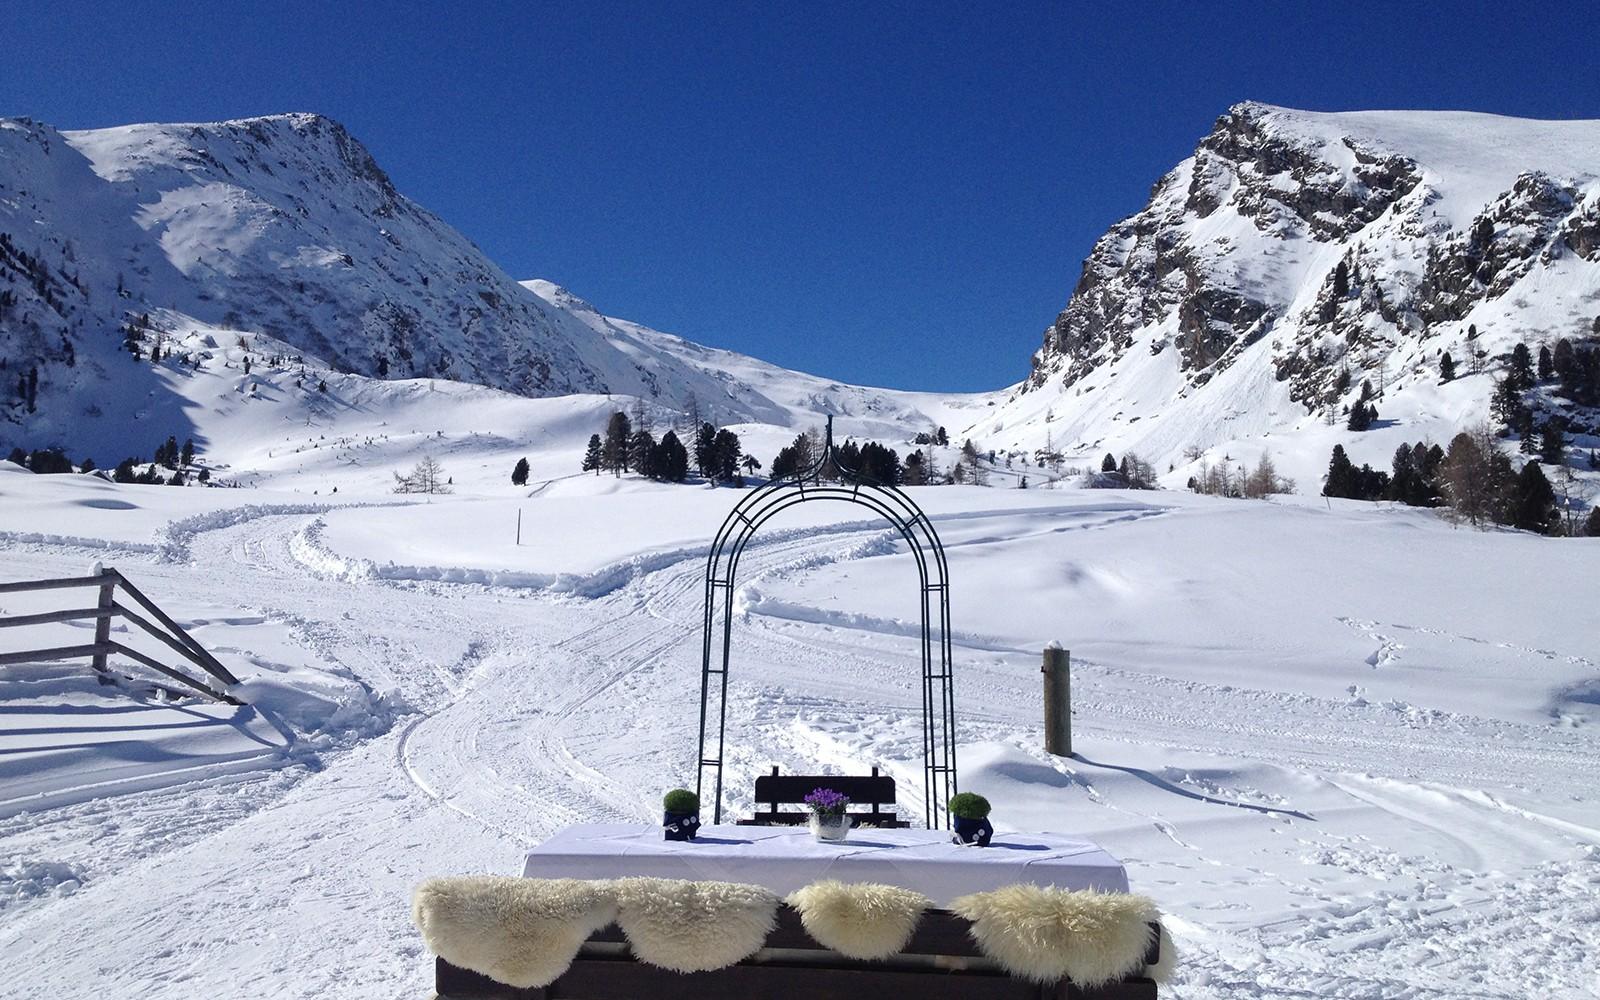 Matrimonio In Montagna : Matrimonio in montagna